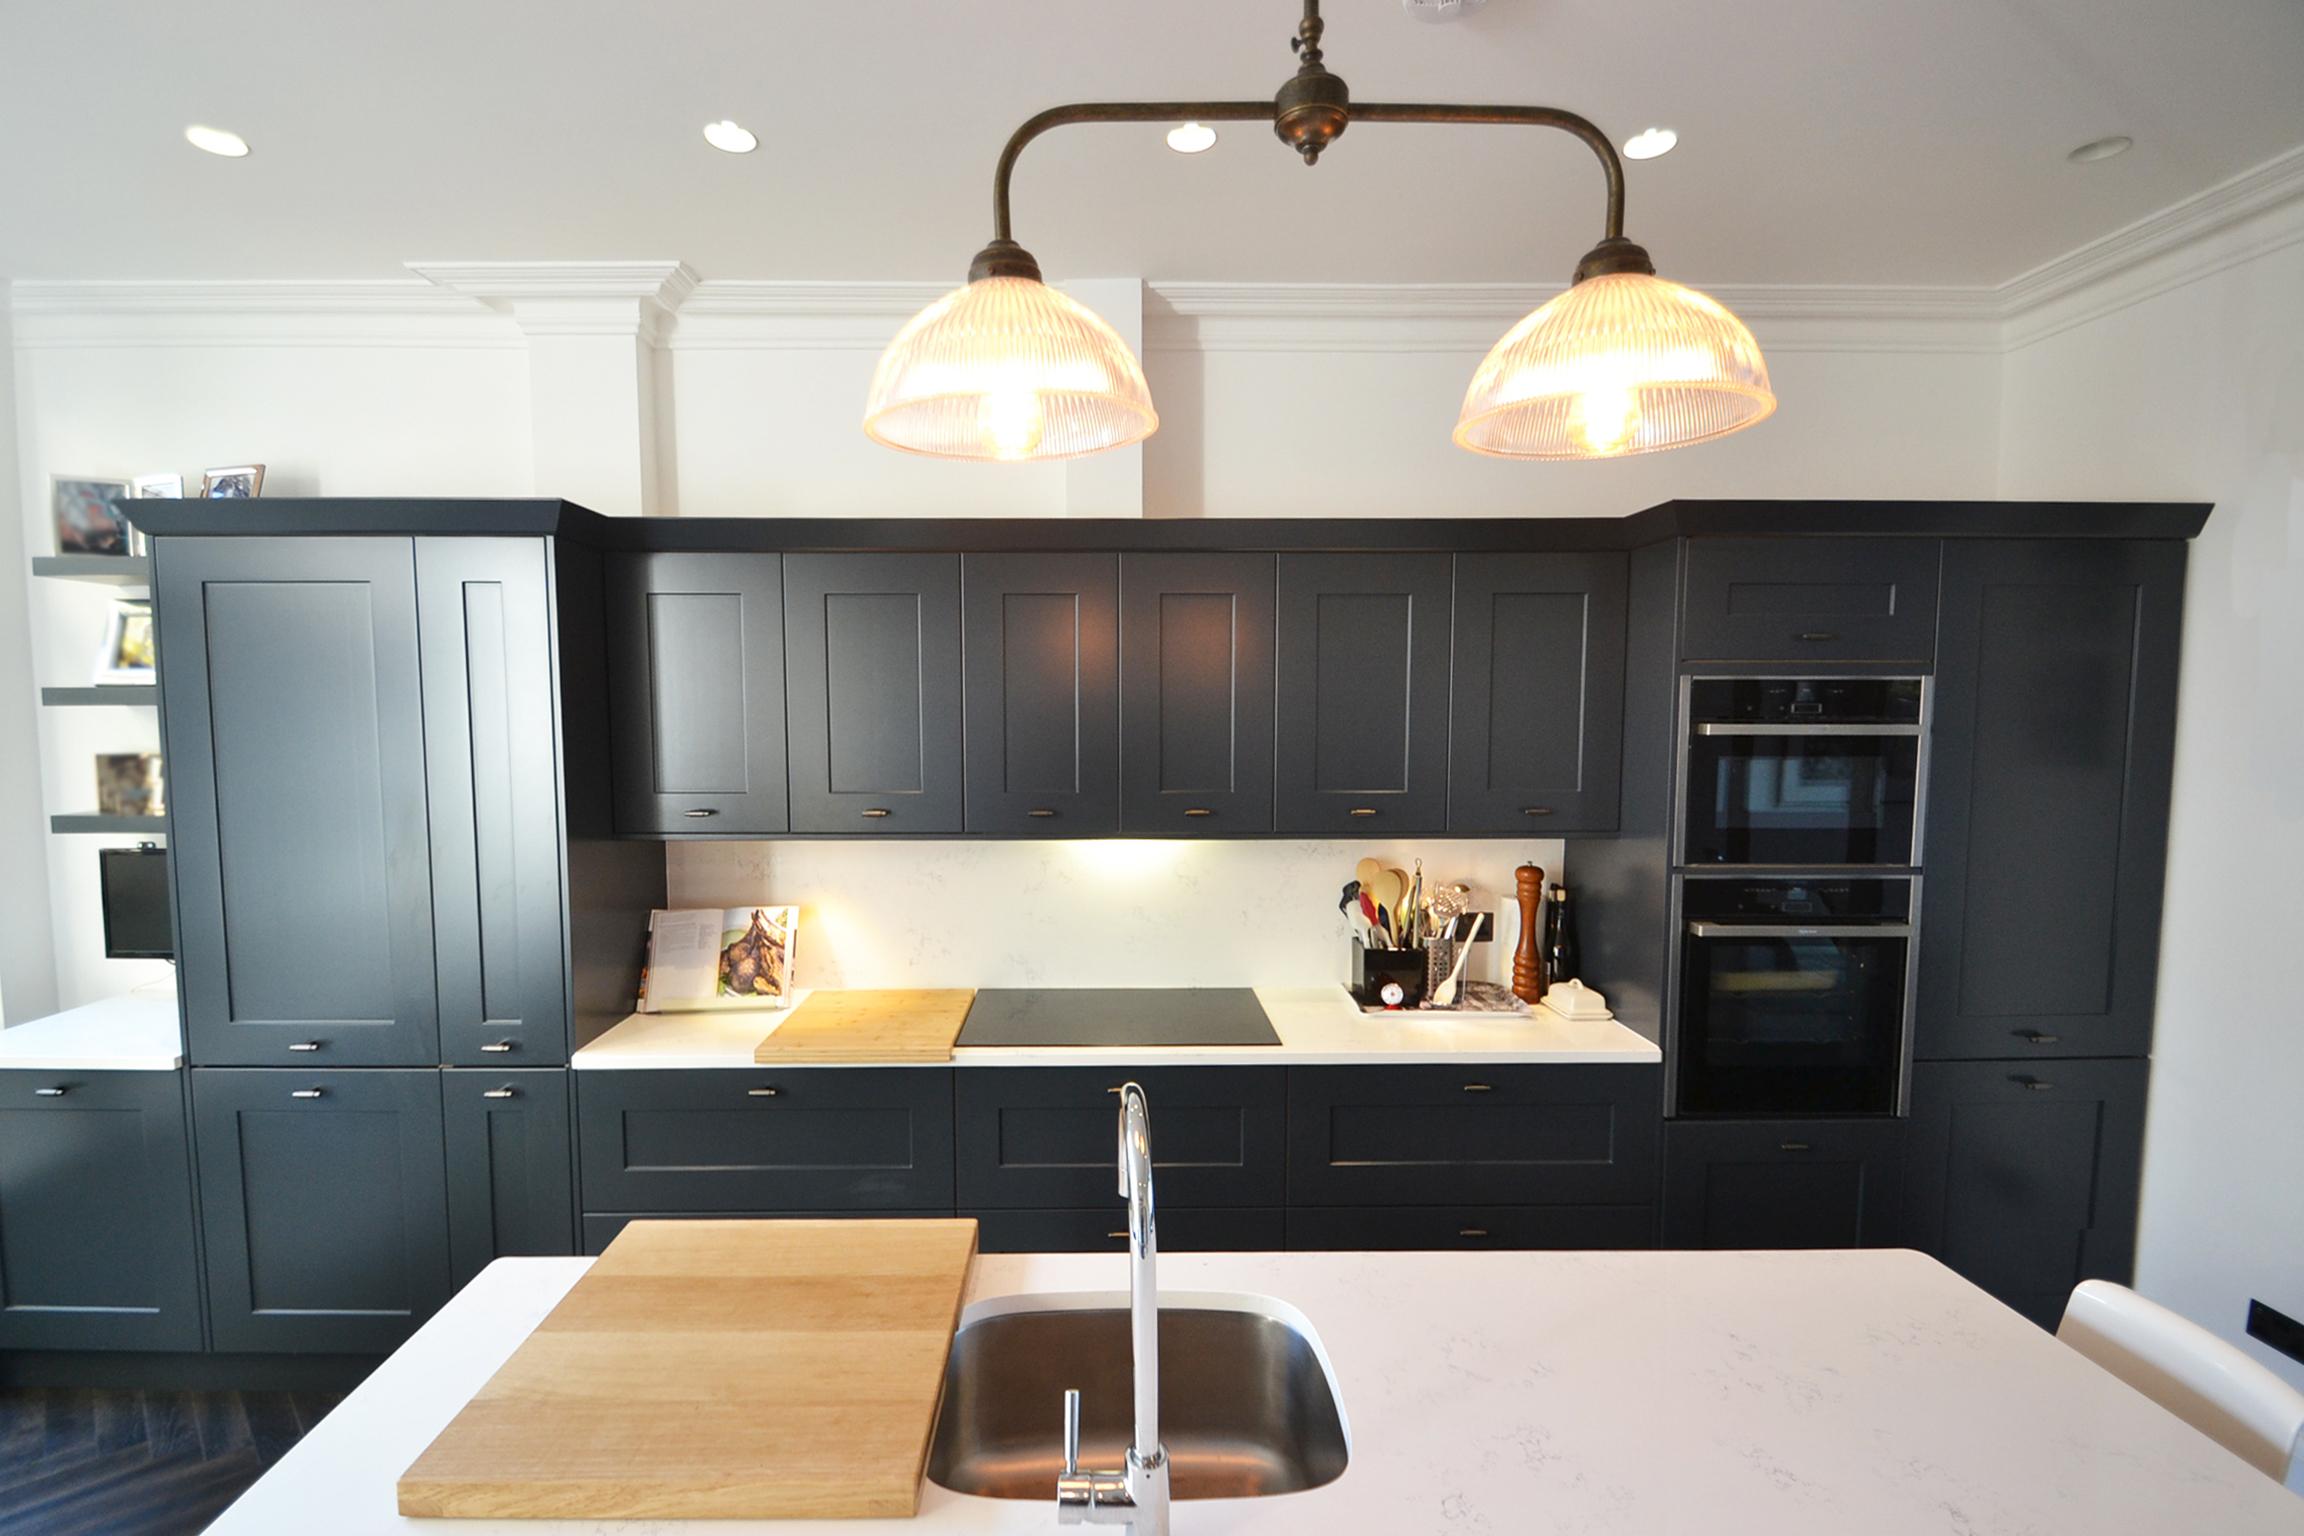 Kitchen supplied by Imaggio Interiors - Chiswick